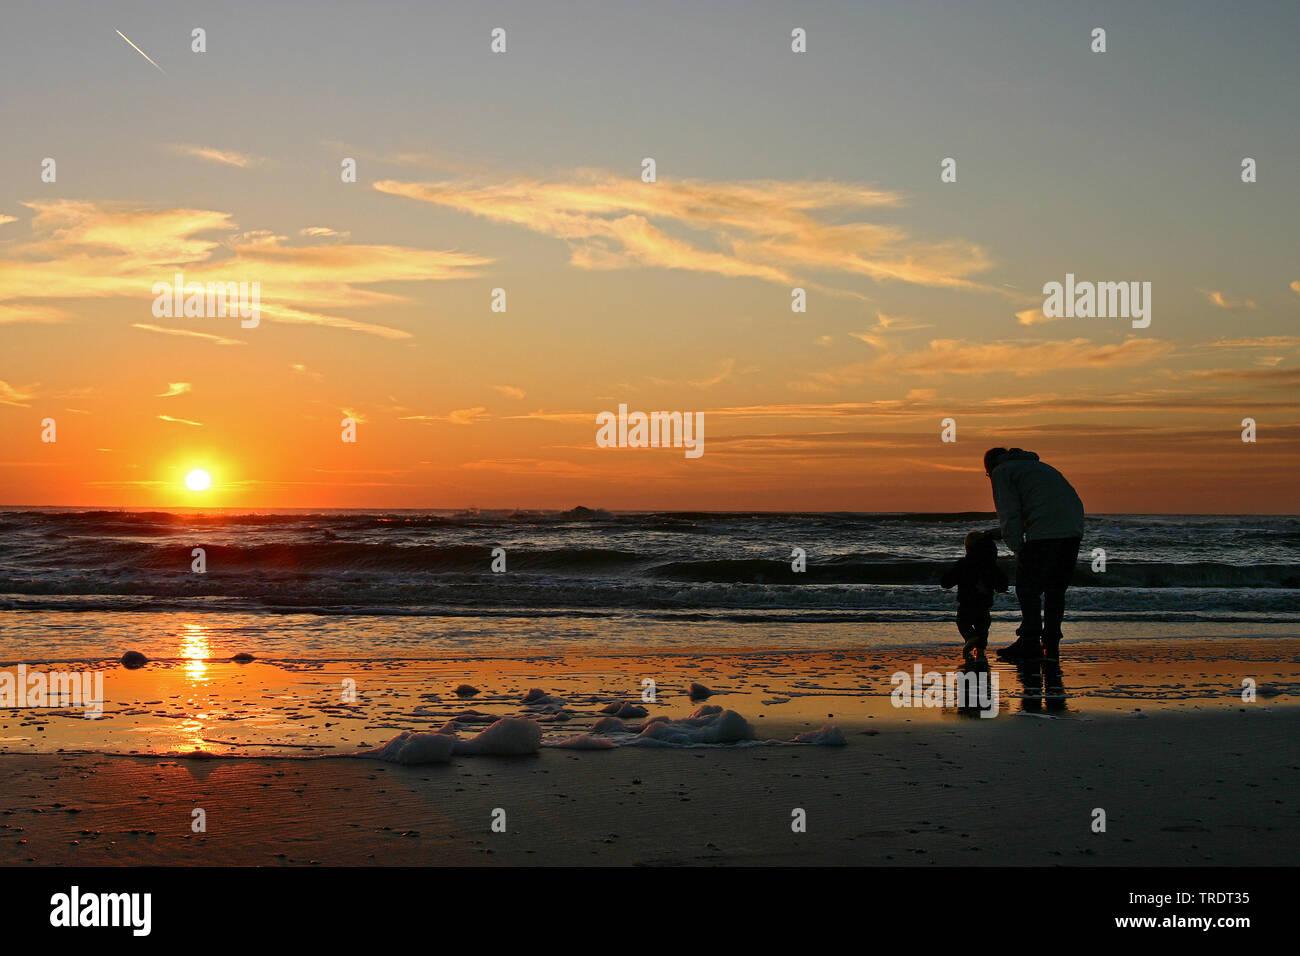 Mann mit kleinem Kind am Strand bei Sonnenuntergang, Niederlande   man with child on the beach at sunset, Netherlands   BLWS509856.jpg [ (c) blickwink - Stock Image